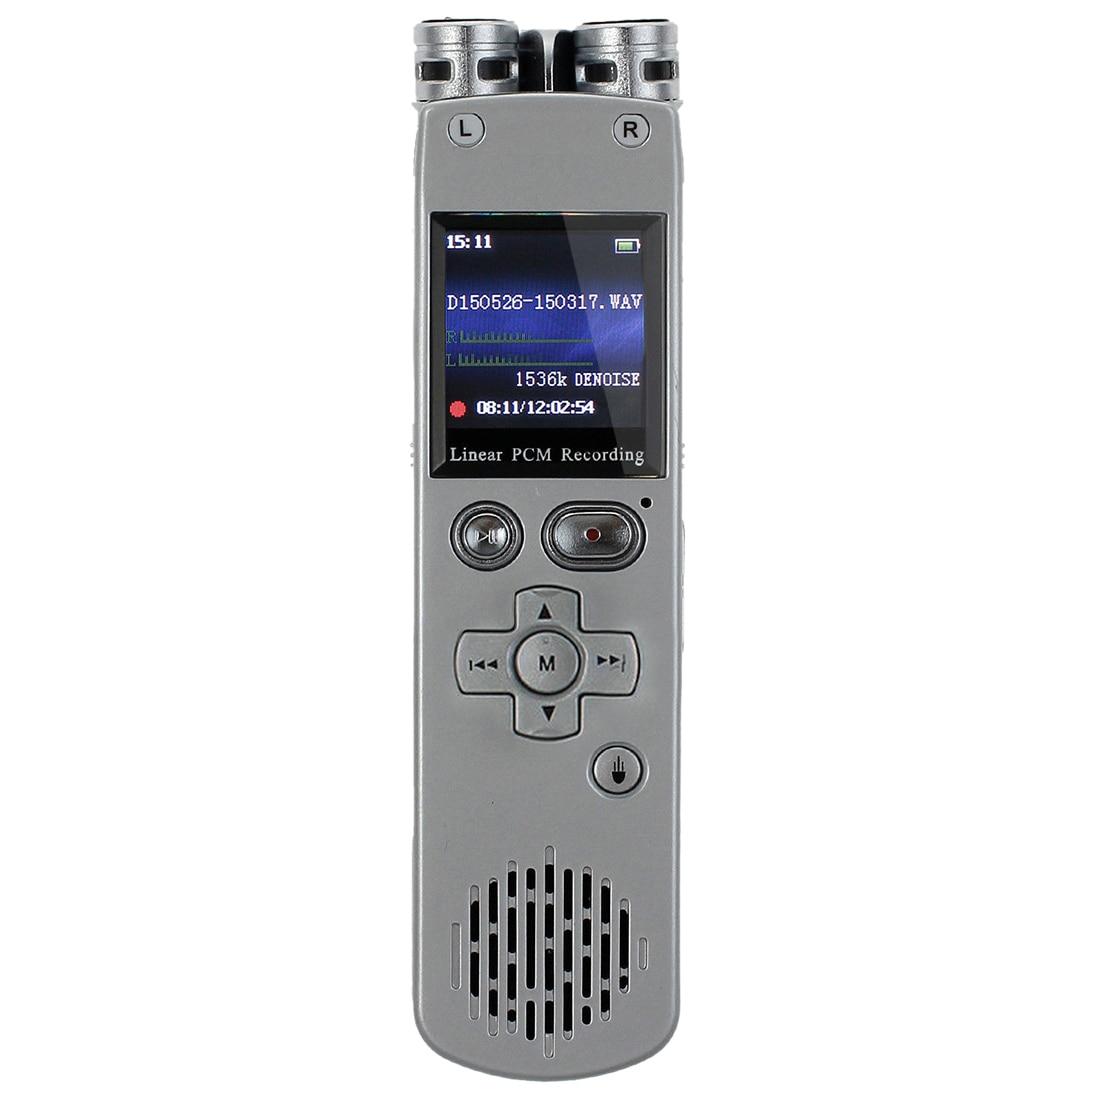 8GB Digital Linear PCM Voice Recorder Presenter Remote Control MP3 Player